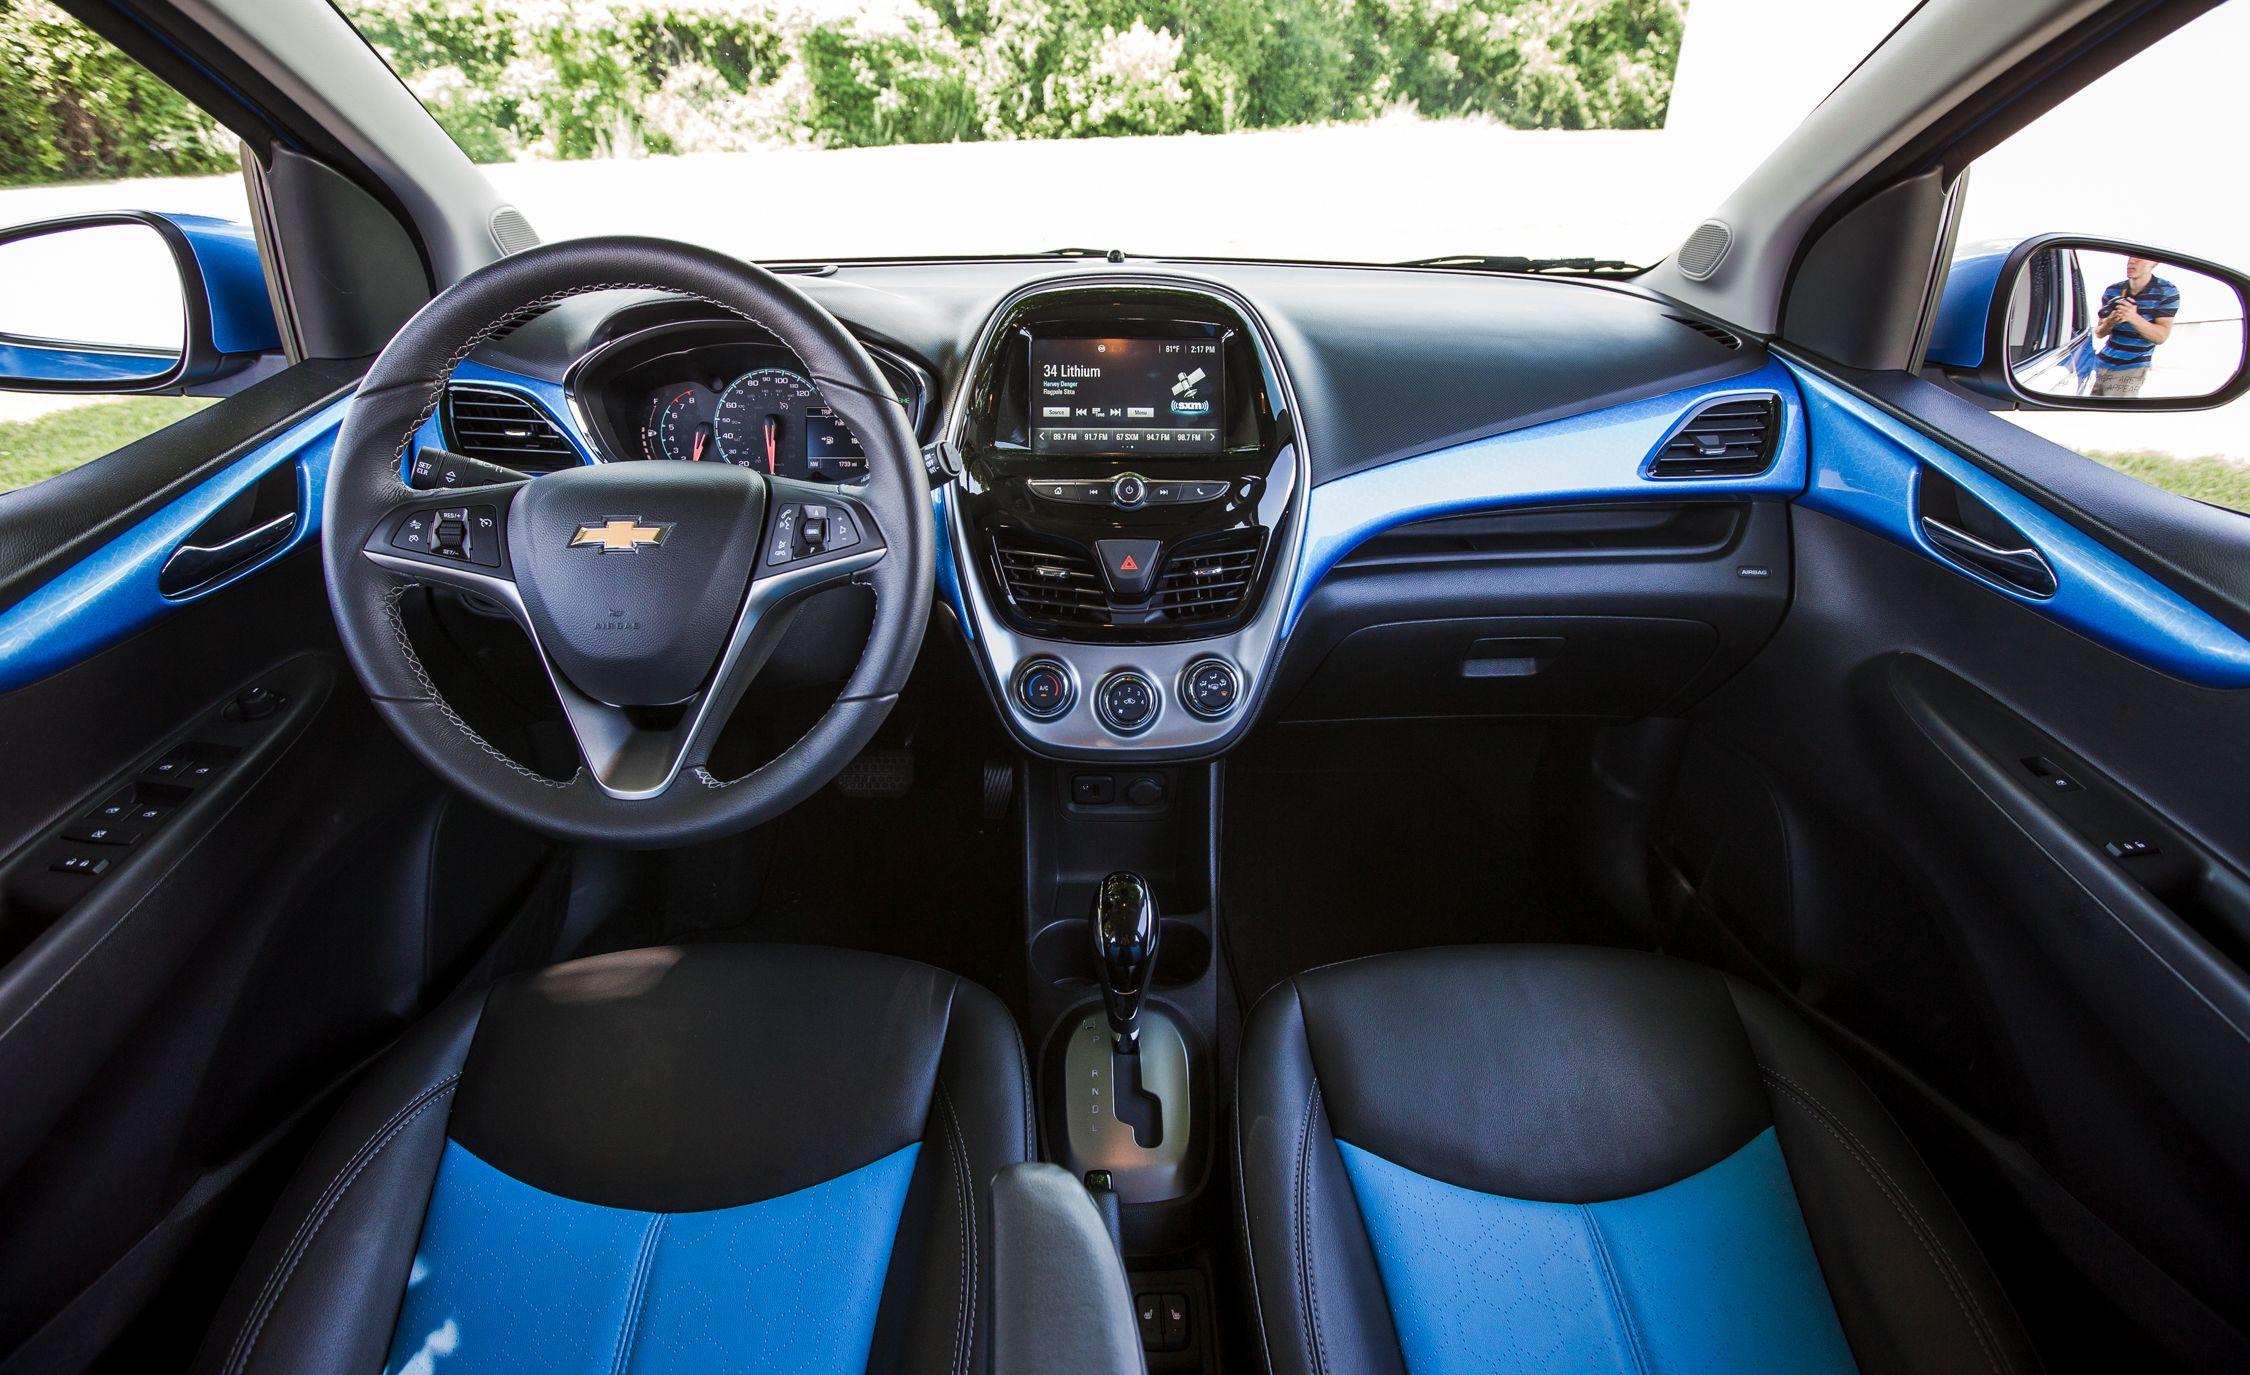 https://hips.hearstapps.com/amv-prod-cad-assets.s3.amazonaws.com/wp-content/uploads/2016/07/2016-Chevrolet-Spark-127.jpg